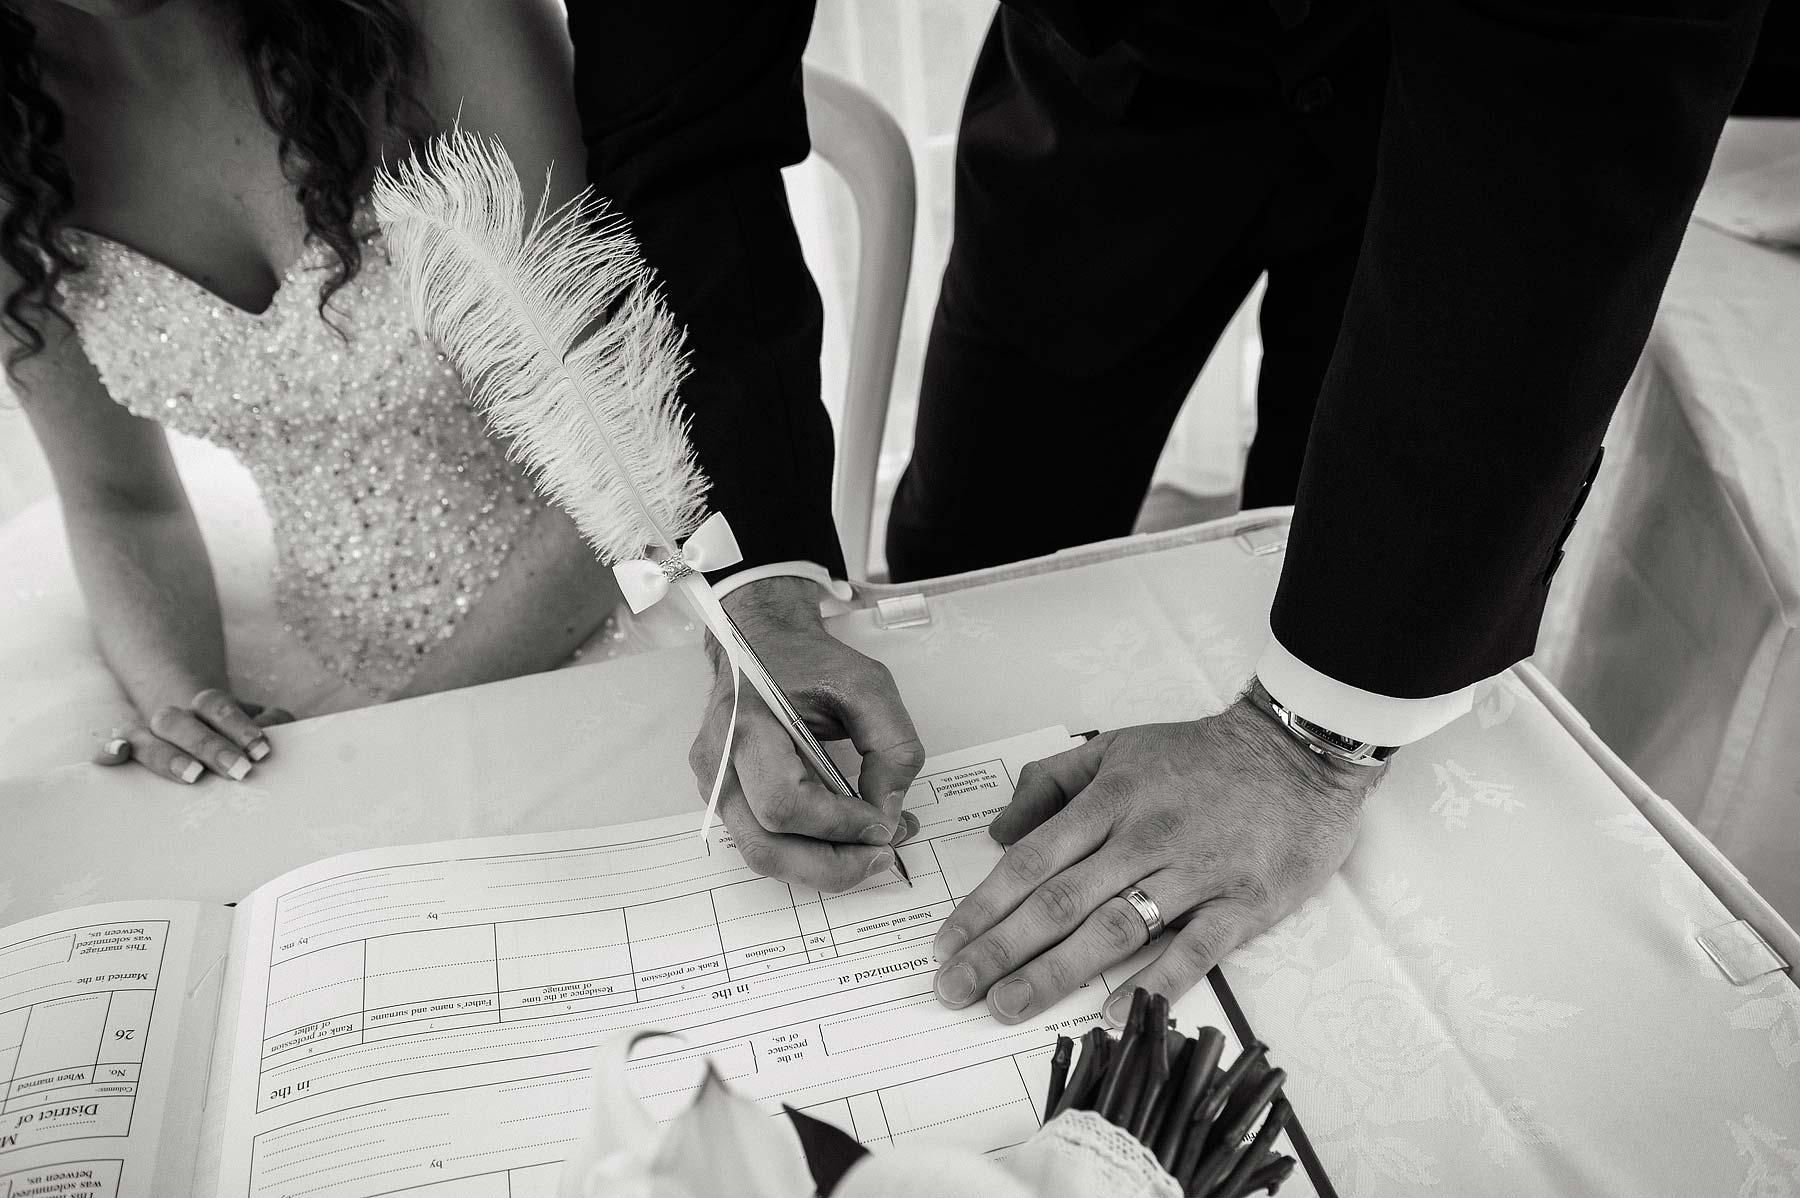 albright-hussey-manor-wedding-photographers-033